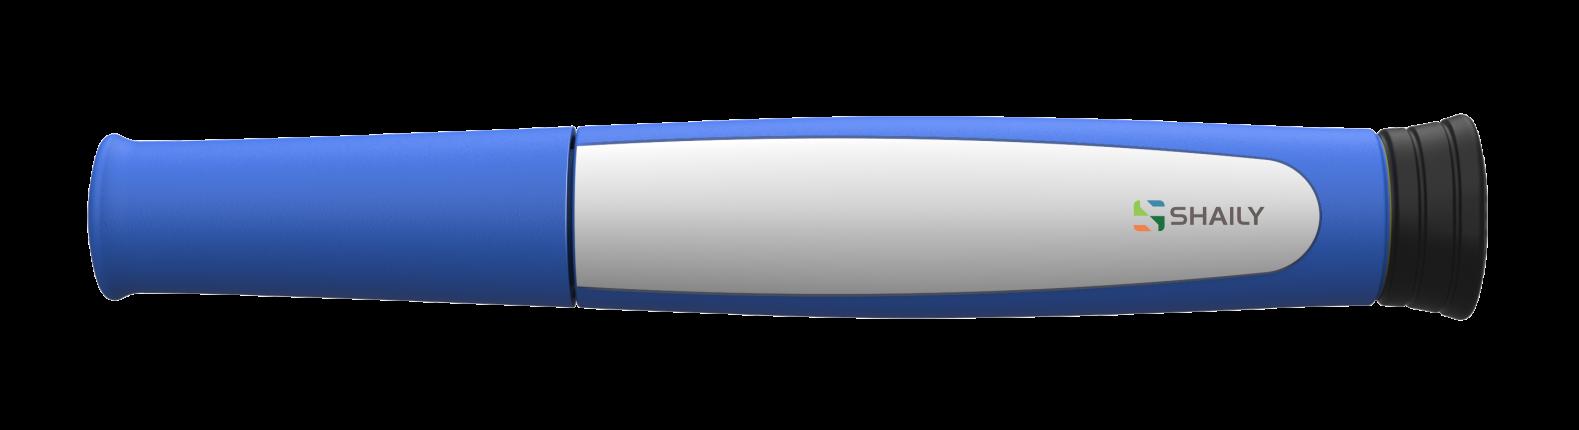 Injection Pen Design